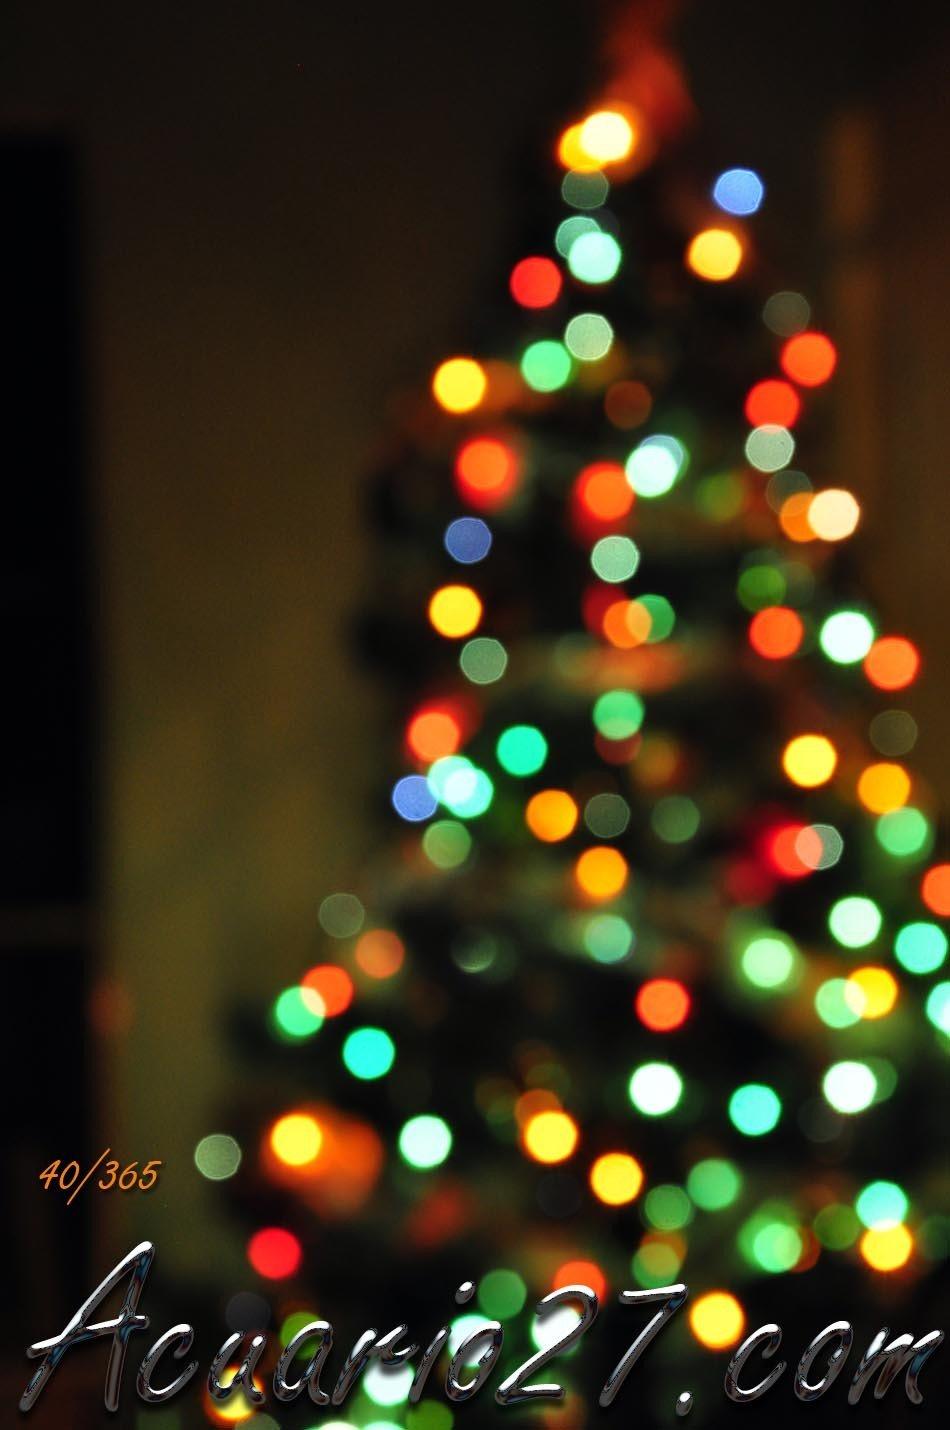 40/365 Feliz Navidad